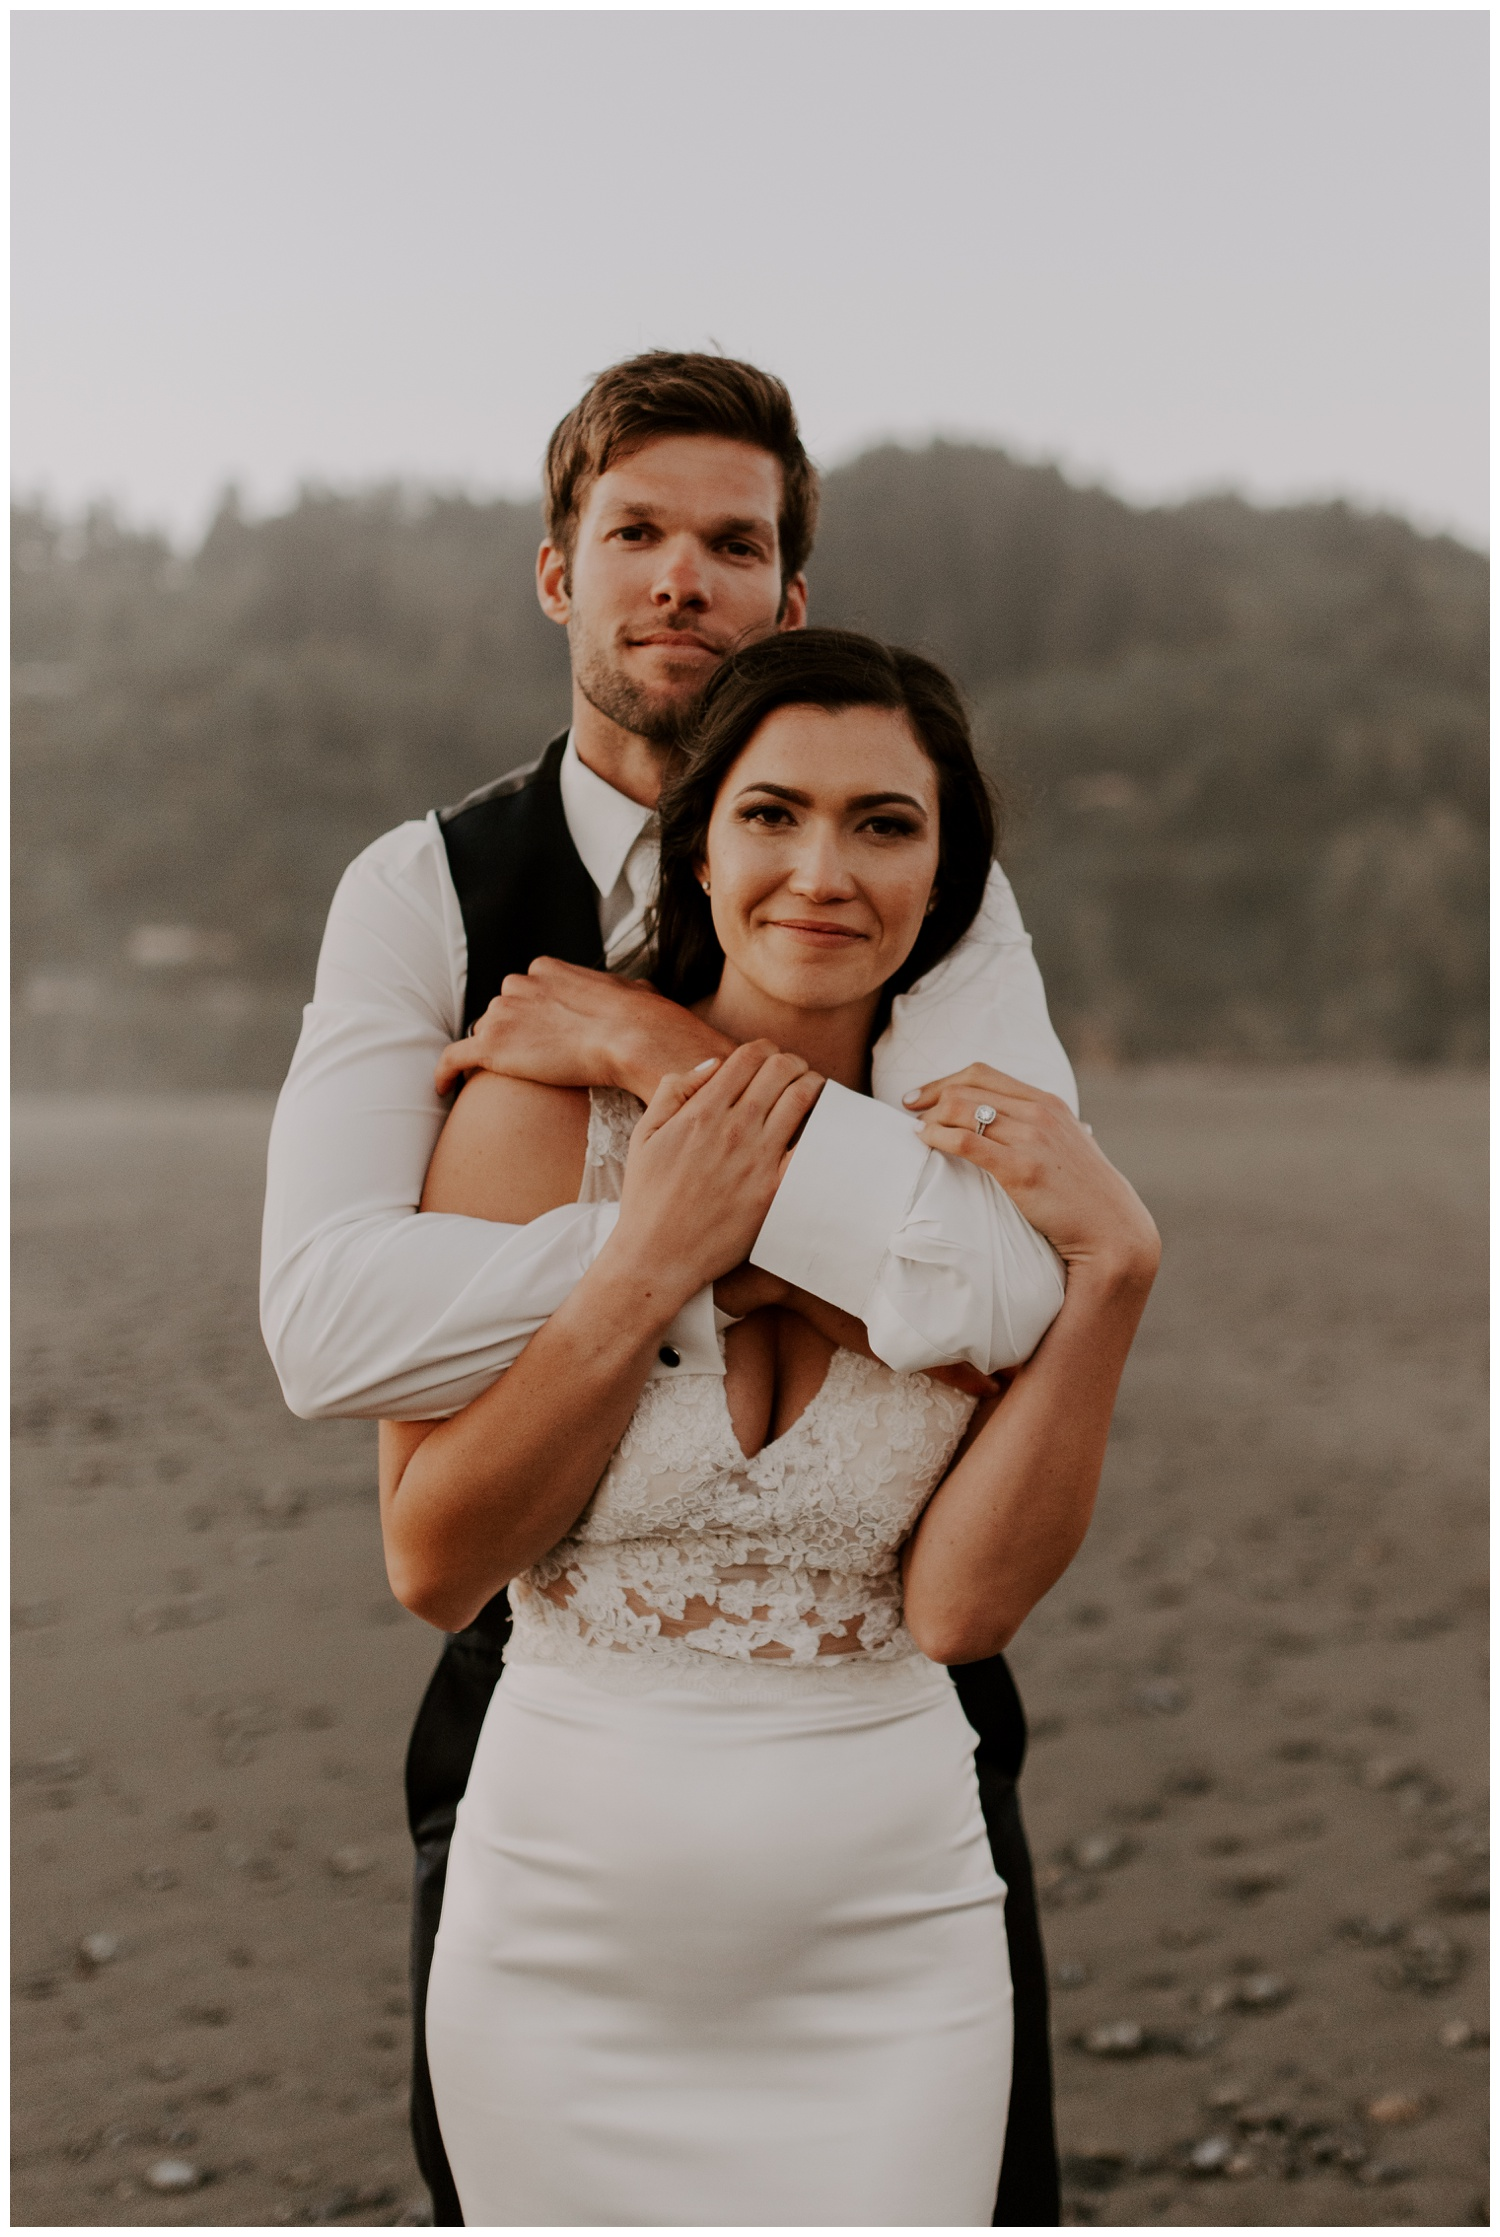 Klamath River Northern California Wedding - Oceana and Kenton - Jessica Heron Images 094.jpg